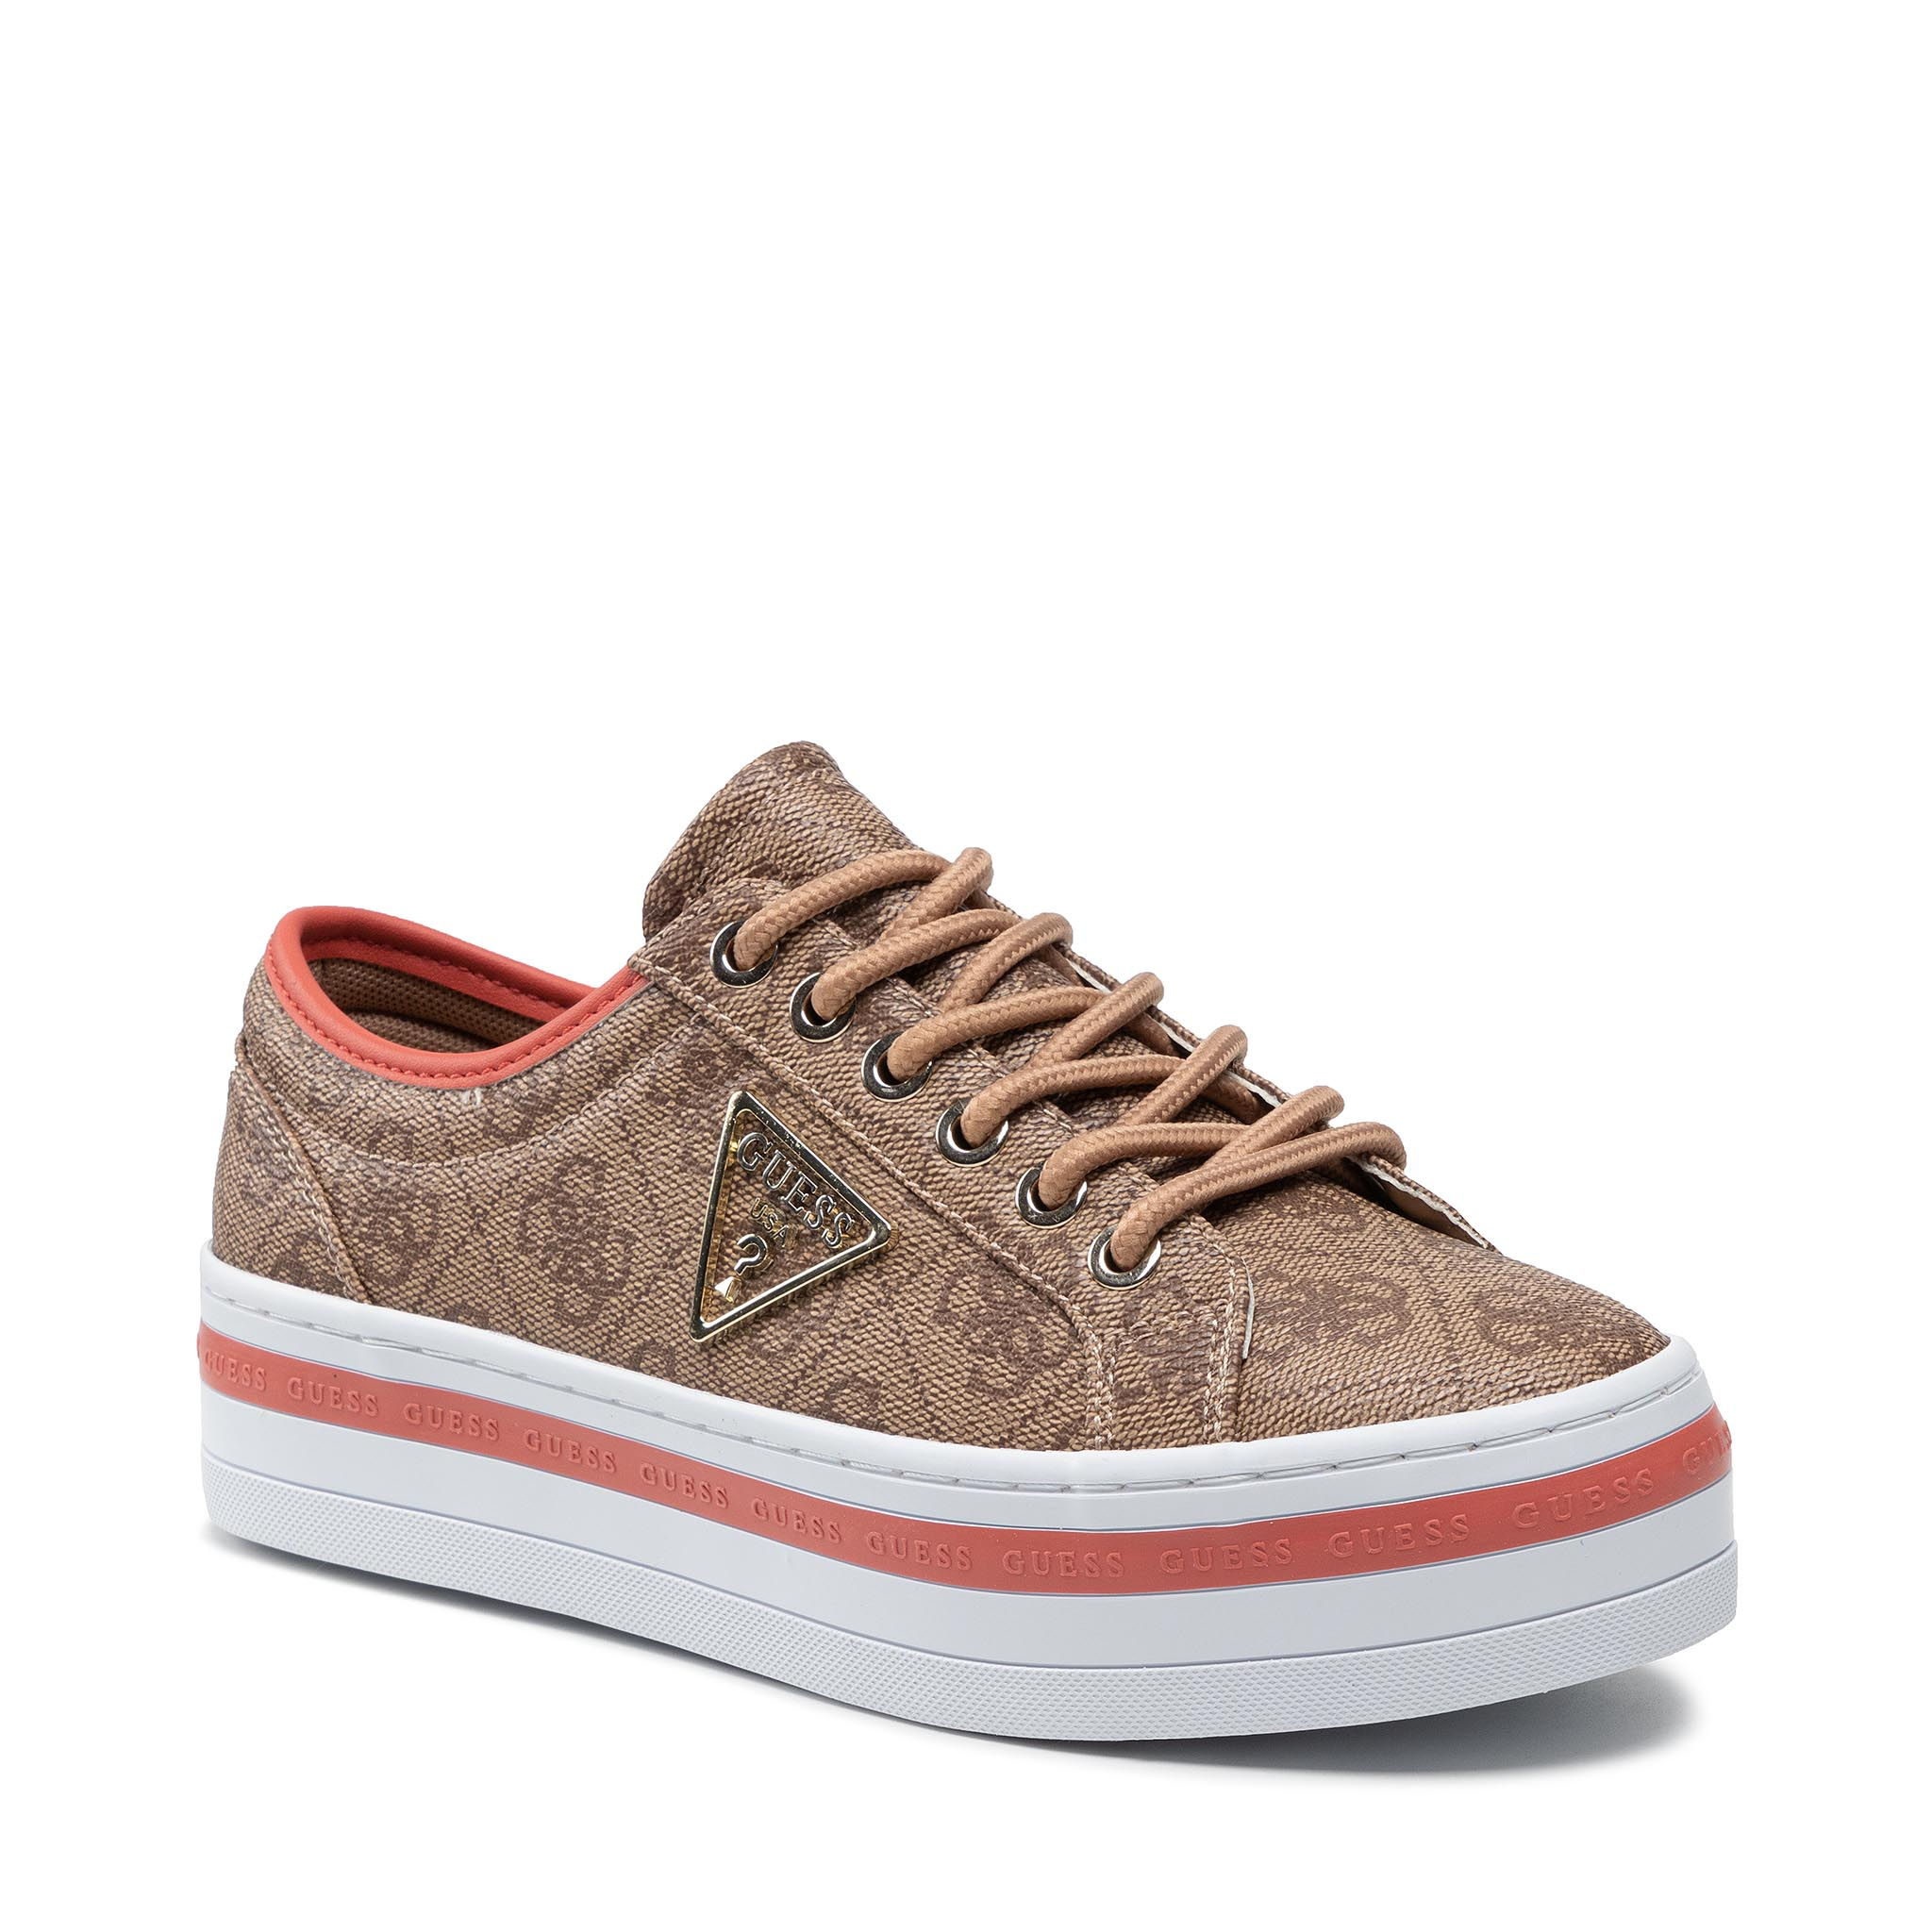 Sneakers GUESS - Bhania FL7BHA FAL12 BEIBR